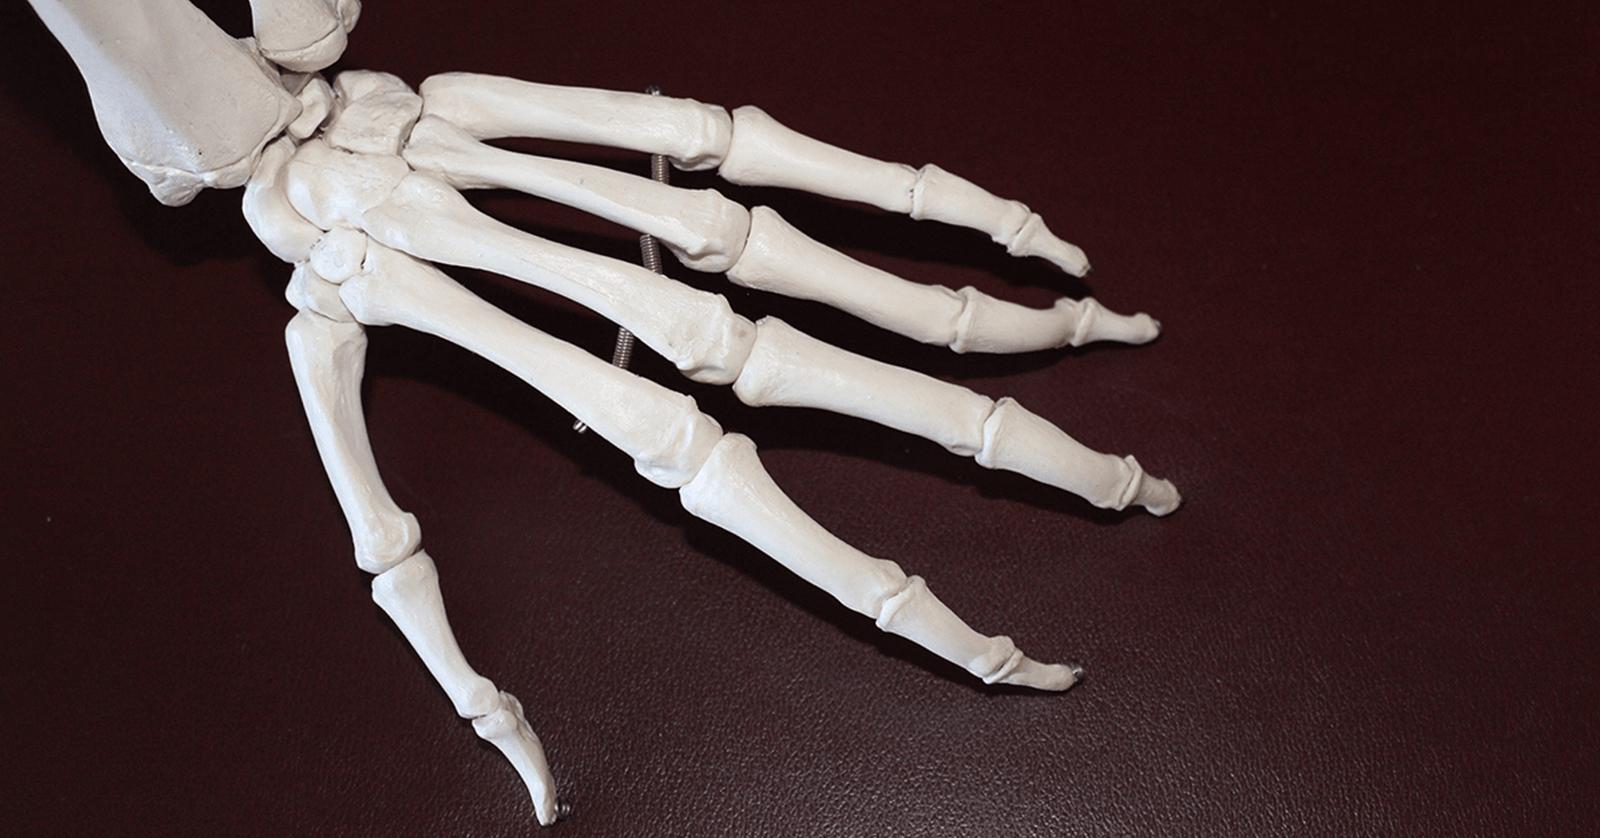 Skeleton model of a hand